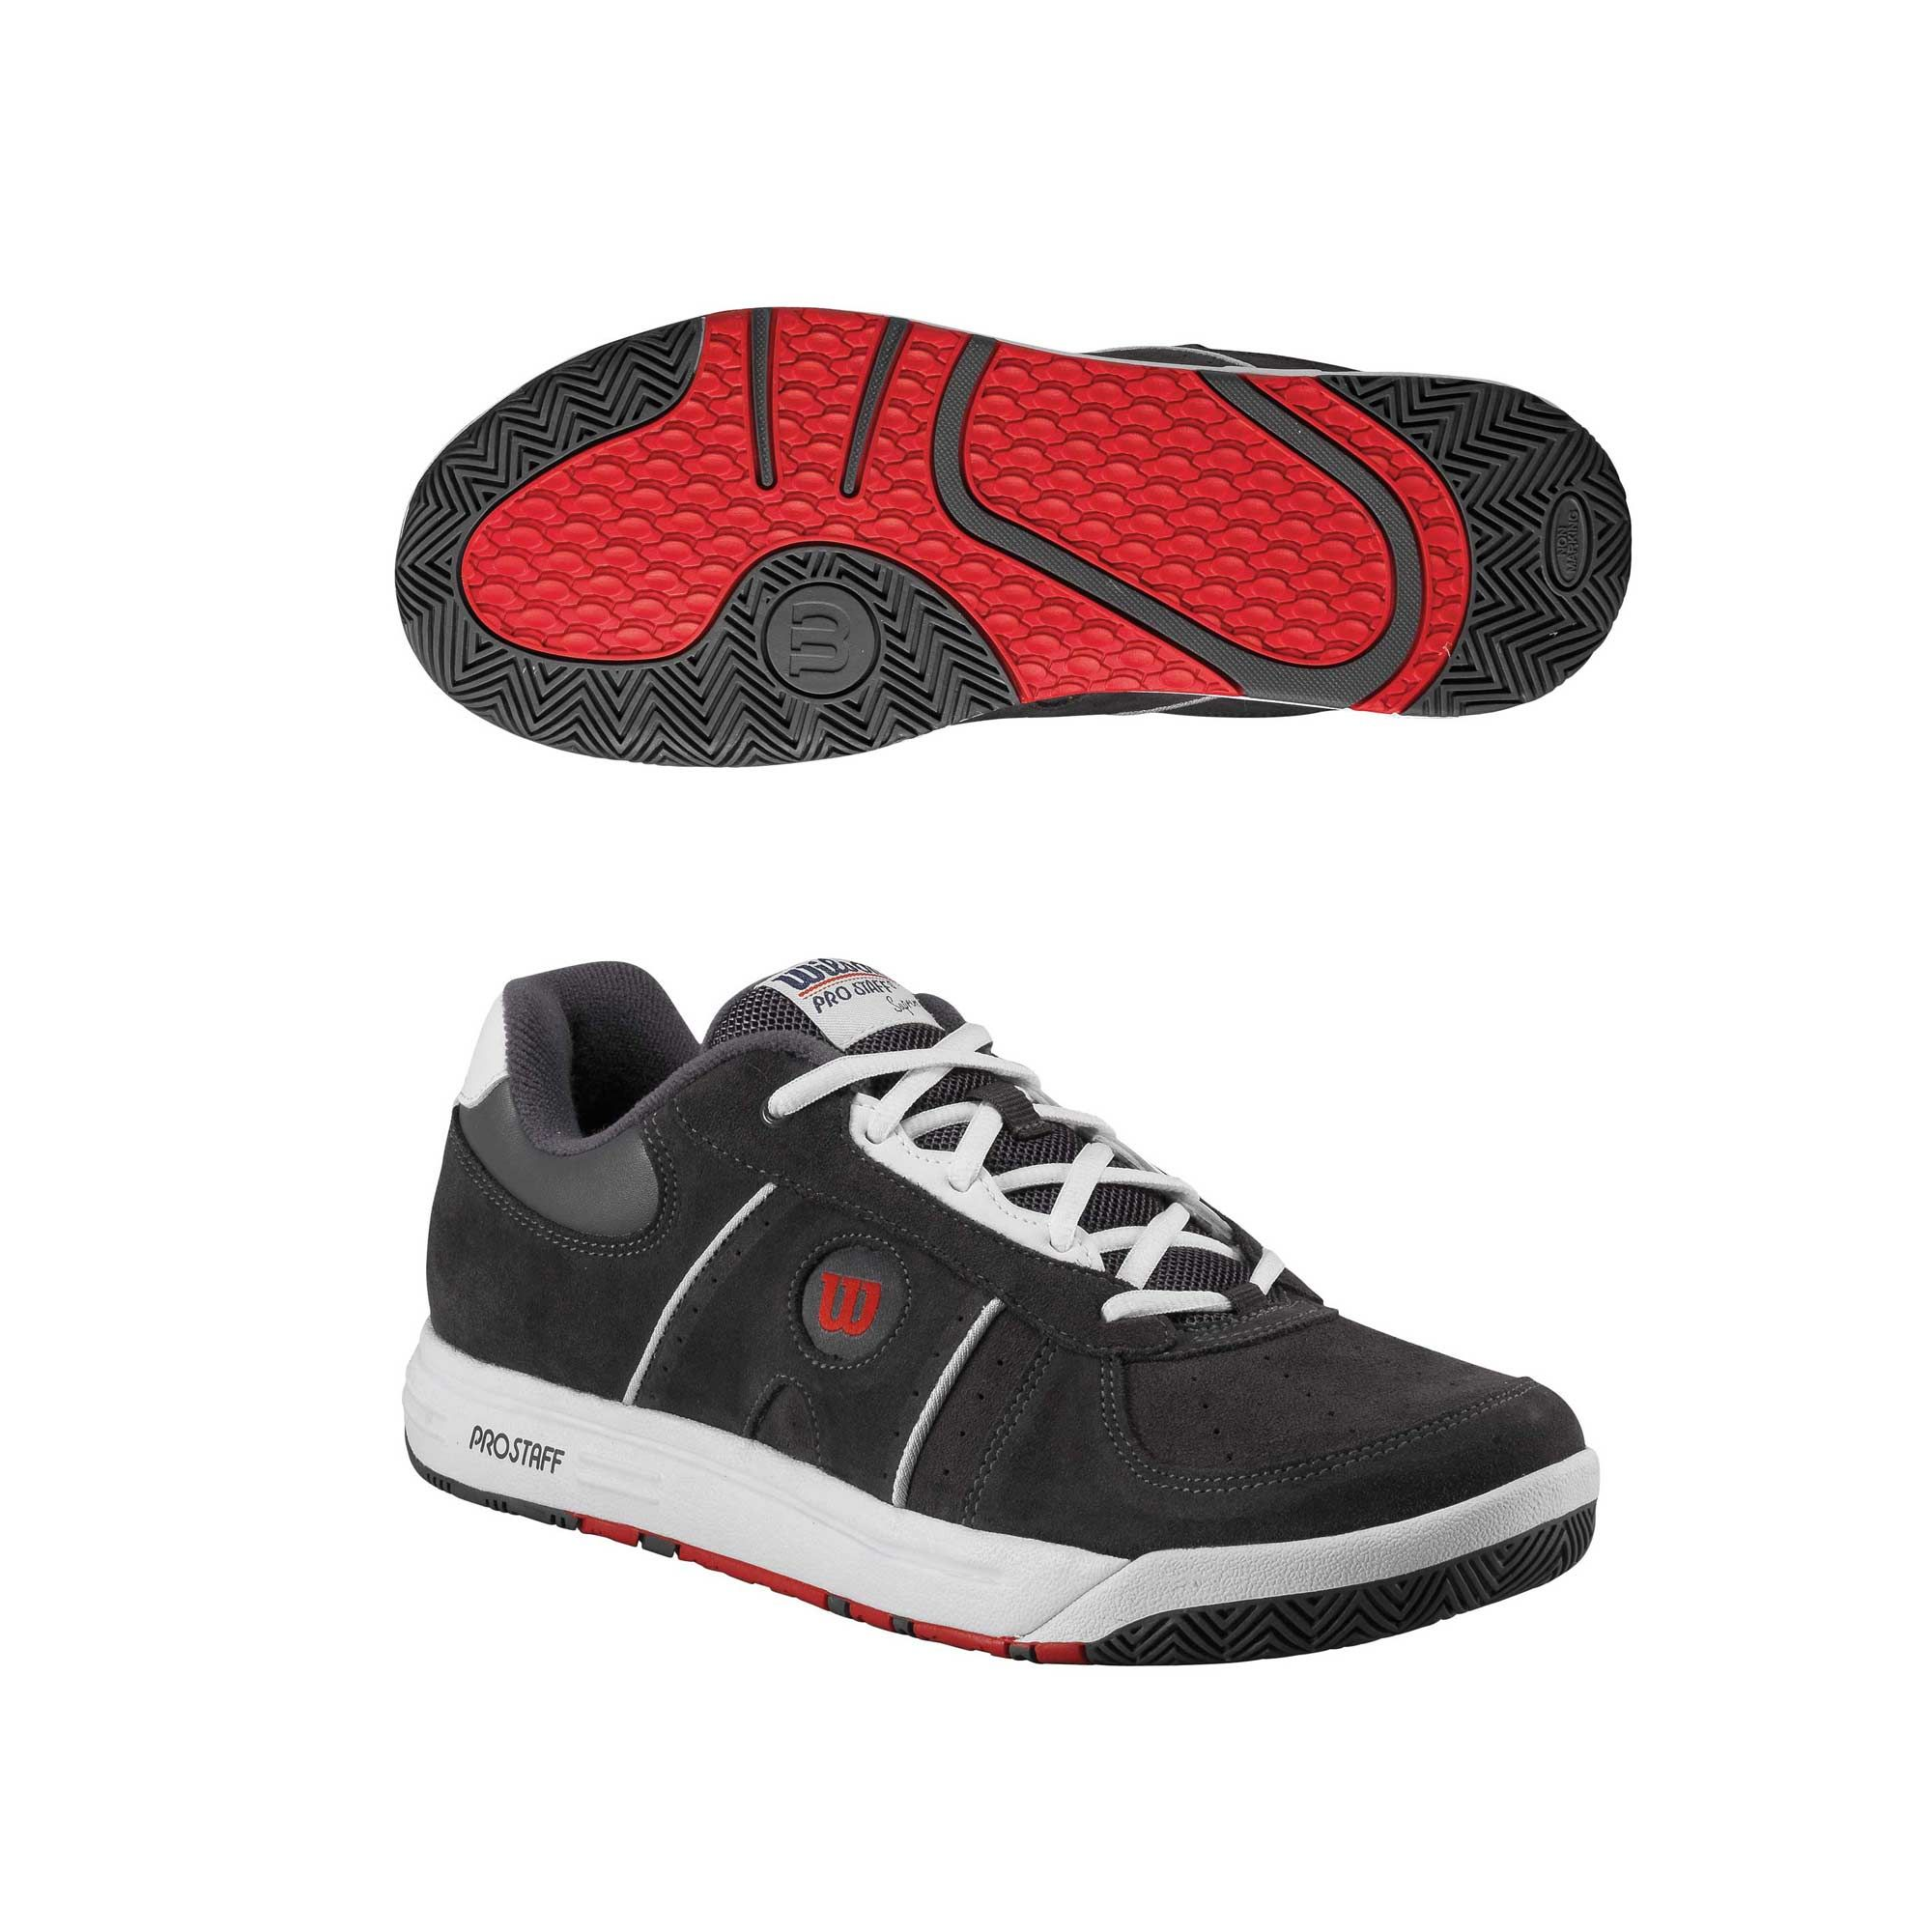 wilson pro staff classic supreme mens tennis shoes